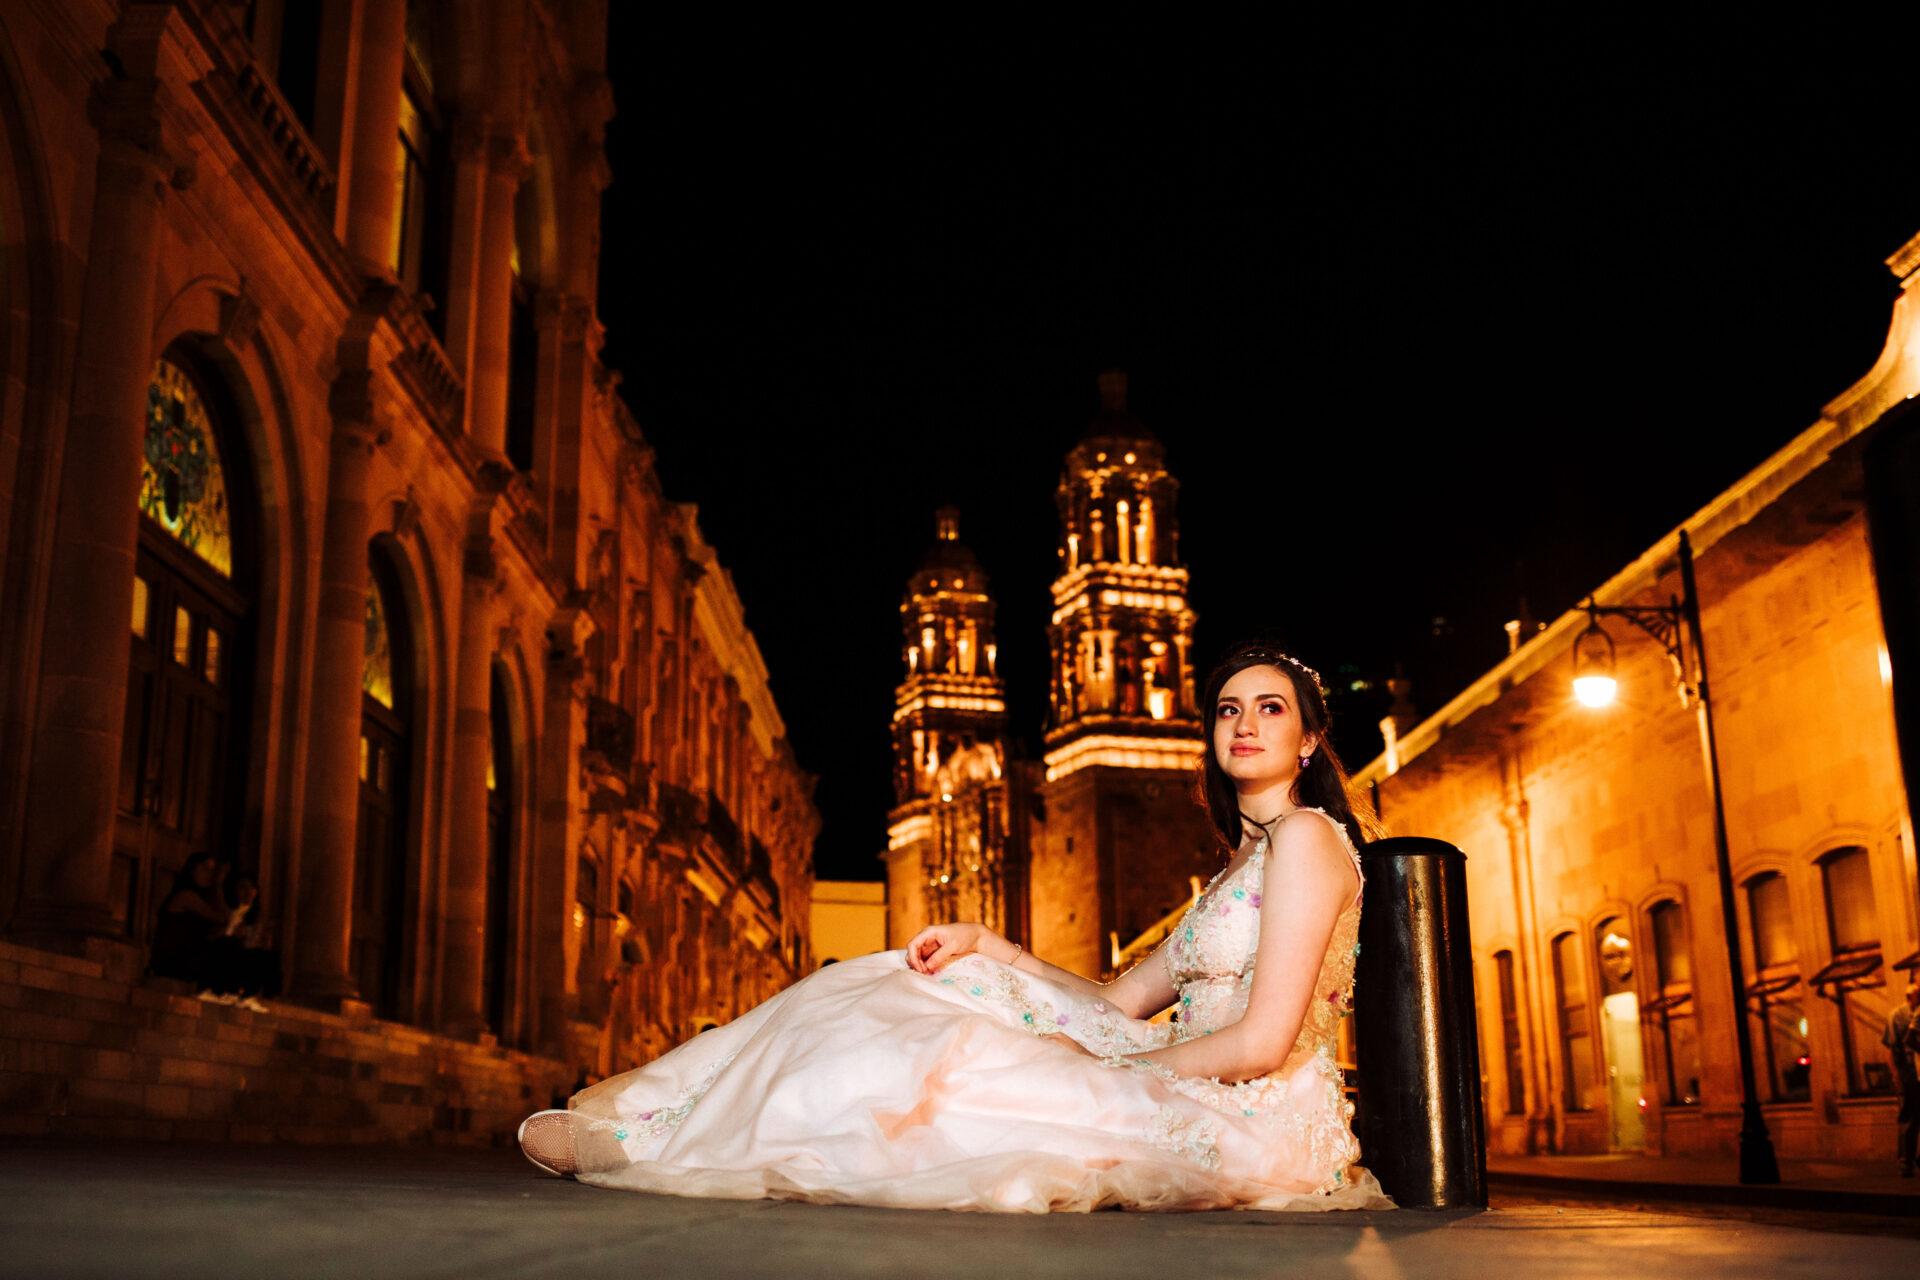 javier_noriega_fotografo_bodas_zacatecas_trash_the_dress_xv_años00008